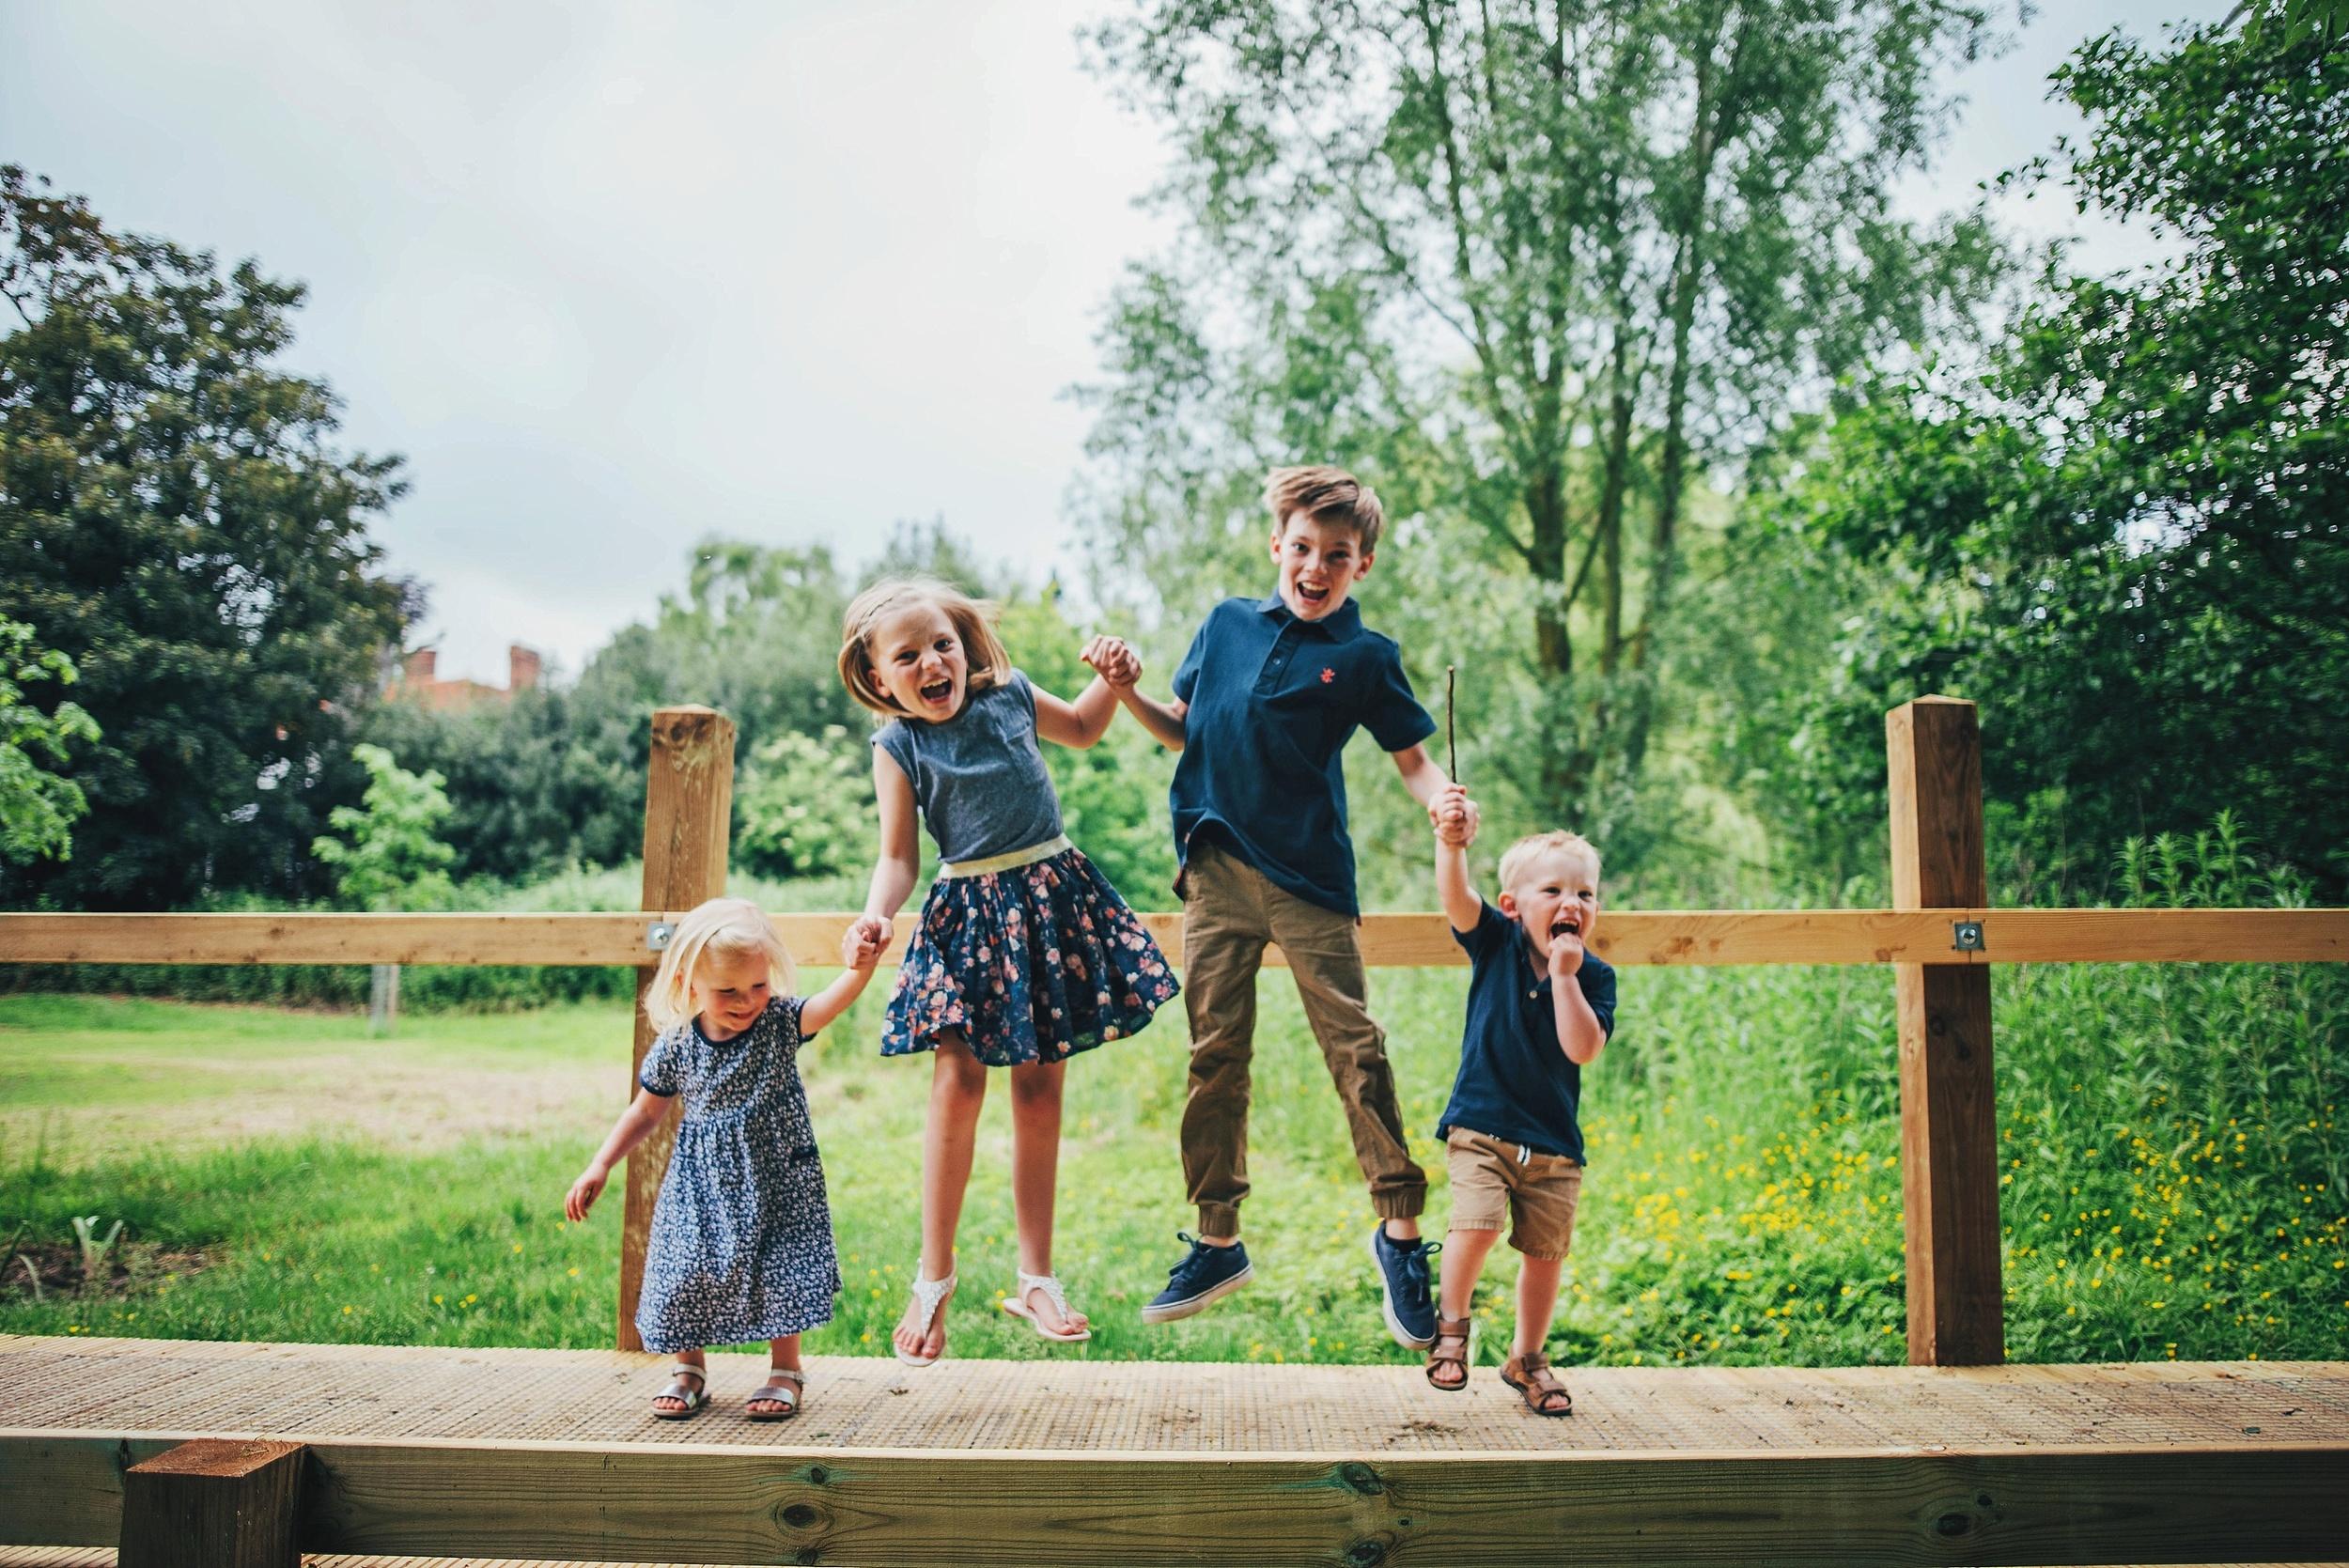 Evening Summer Family Portrait Shoot Braintree Essex UK Documentary Portrait and Lifestyle Photographer